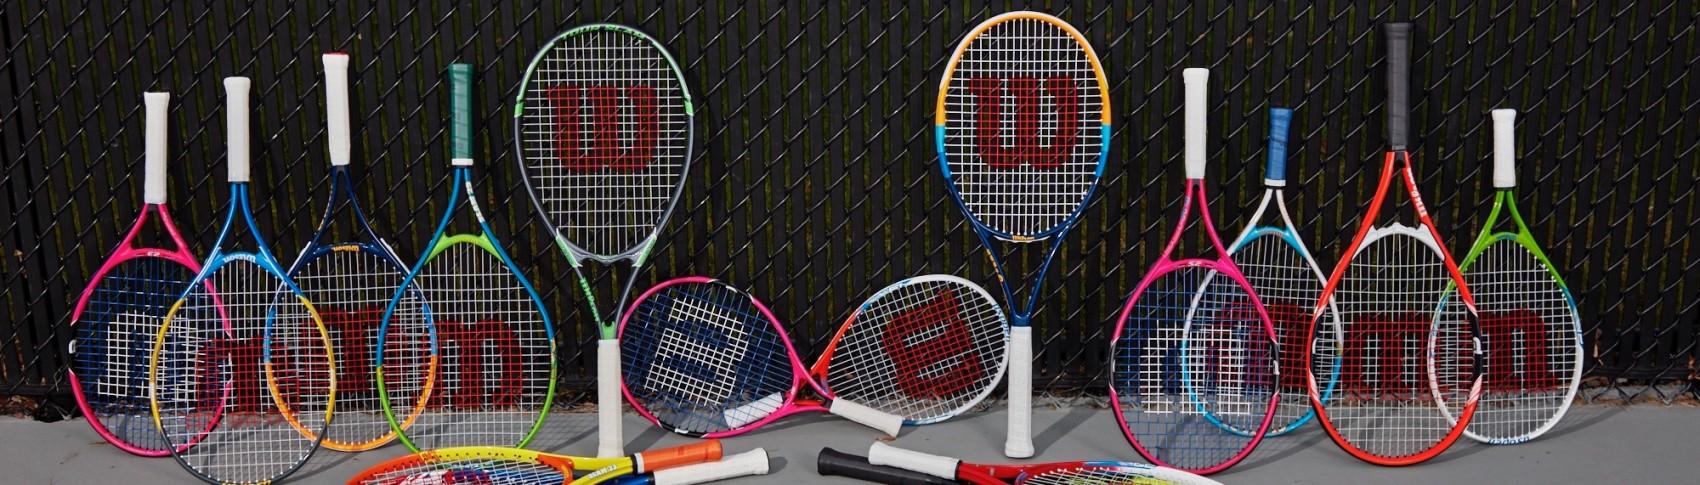 Erwachsenen Rackets